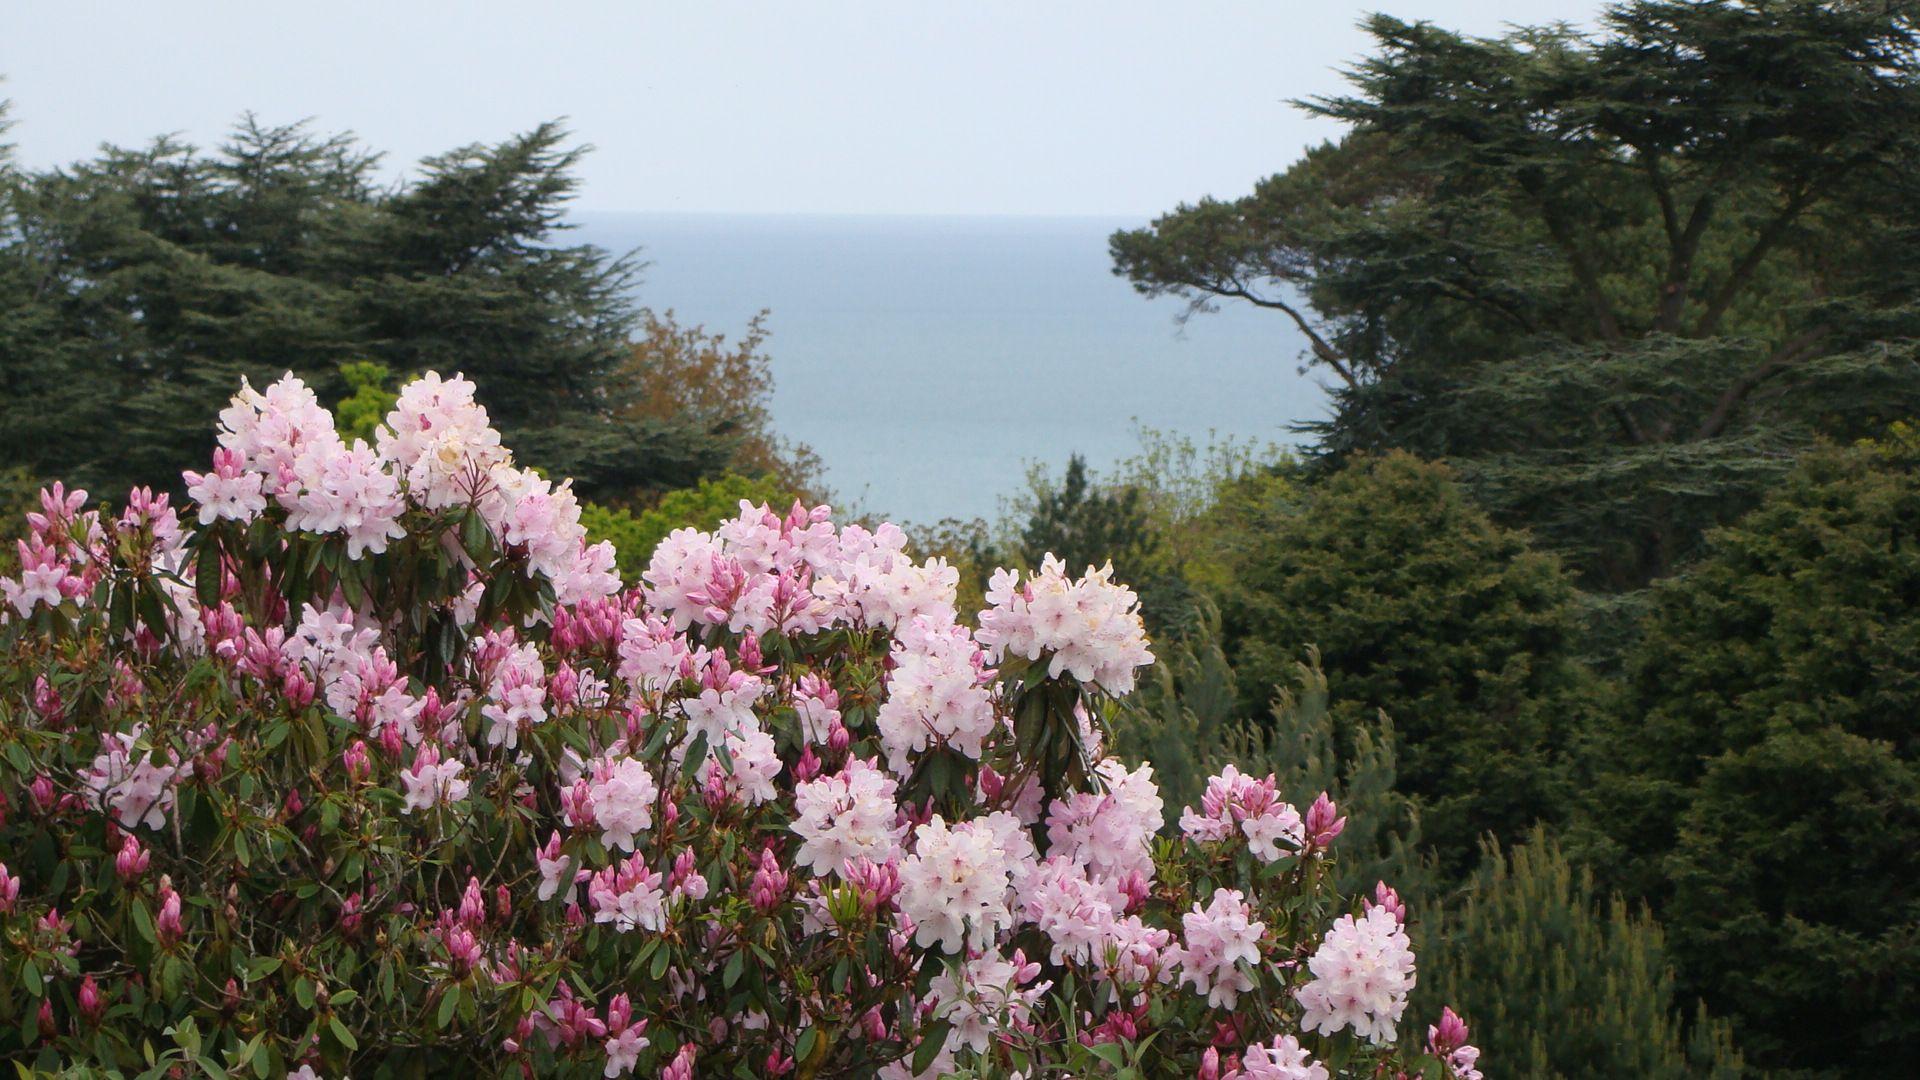 Rhododendron Bois Des Moutiers Varengeville Rhododendron Vita Sackville West Seine Maritime